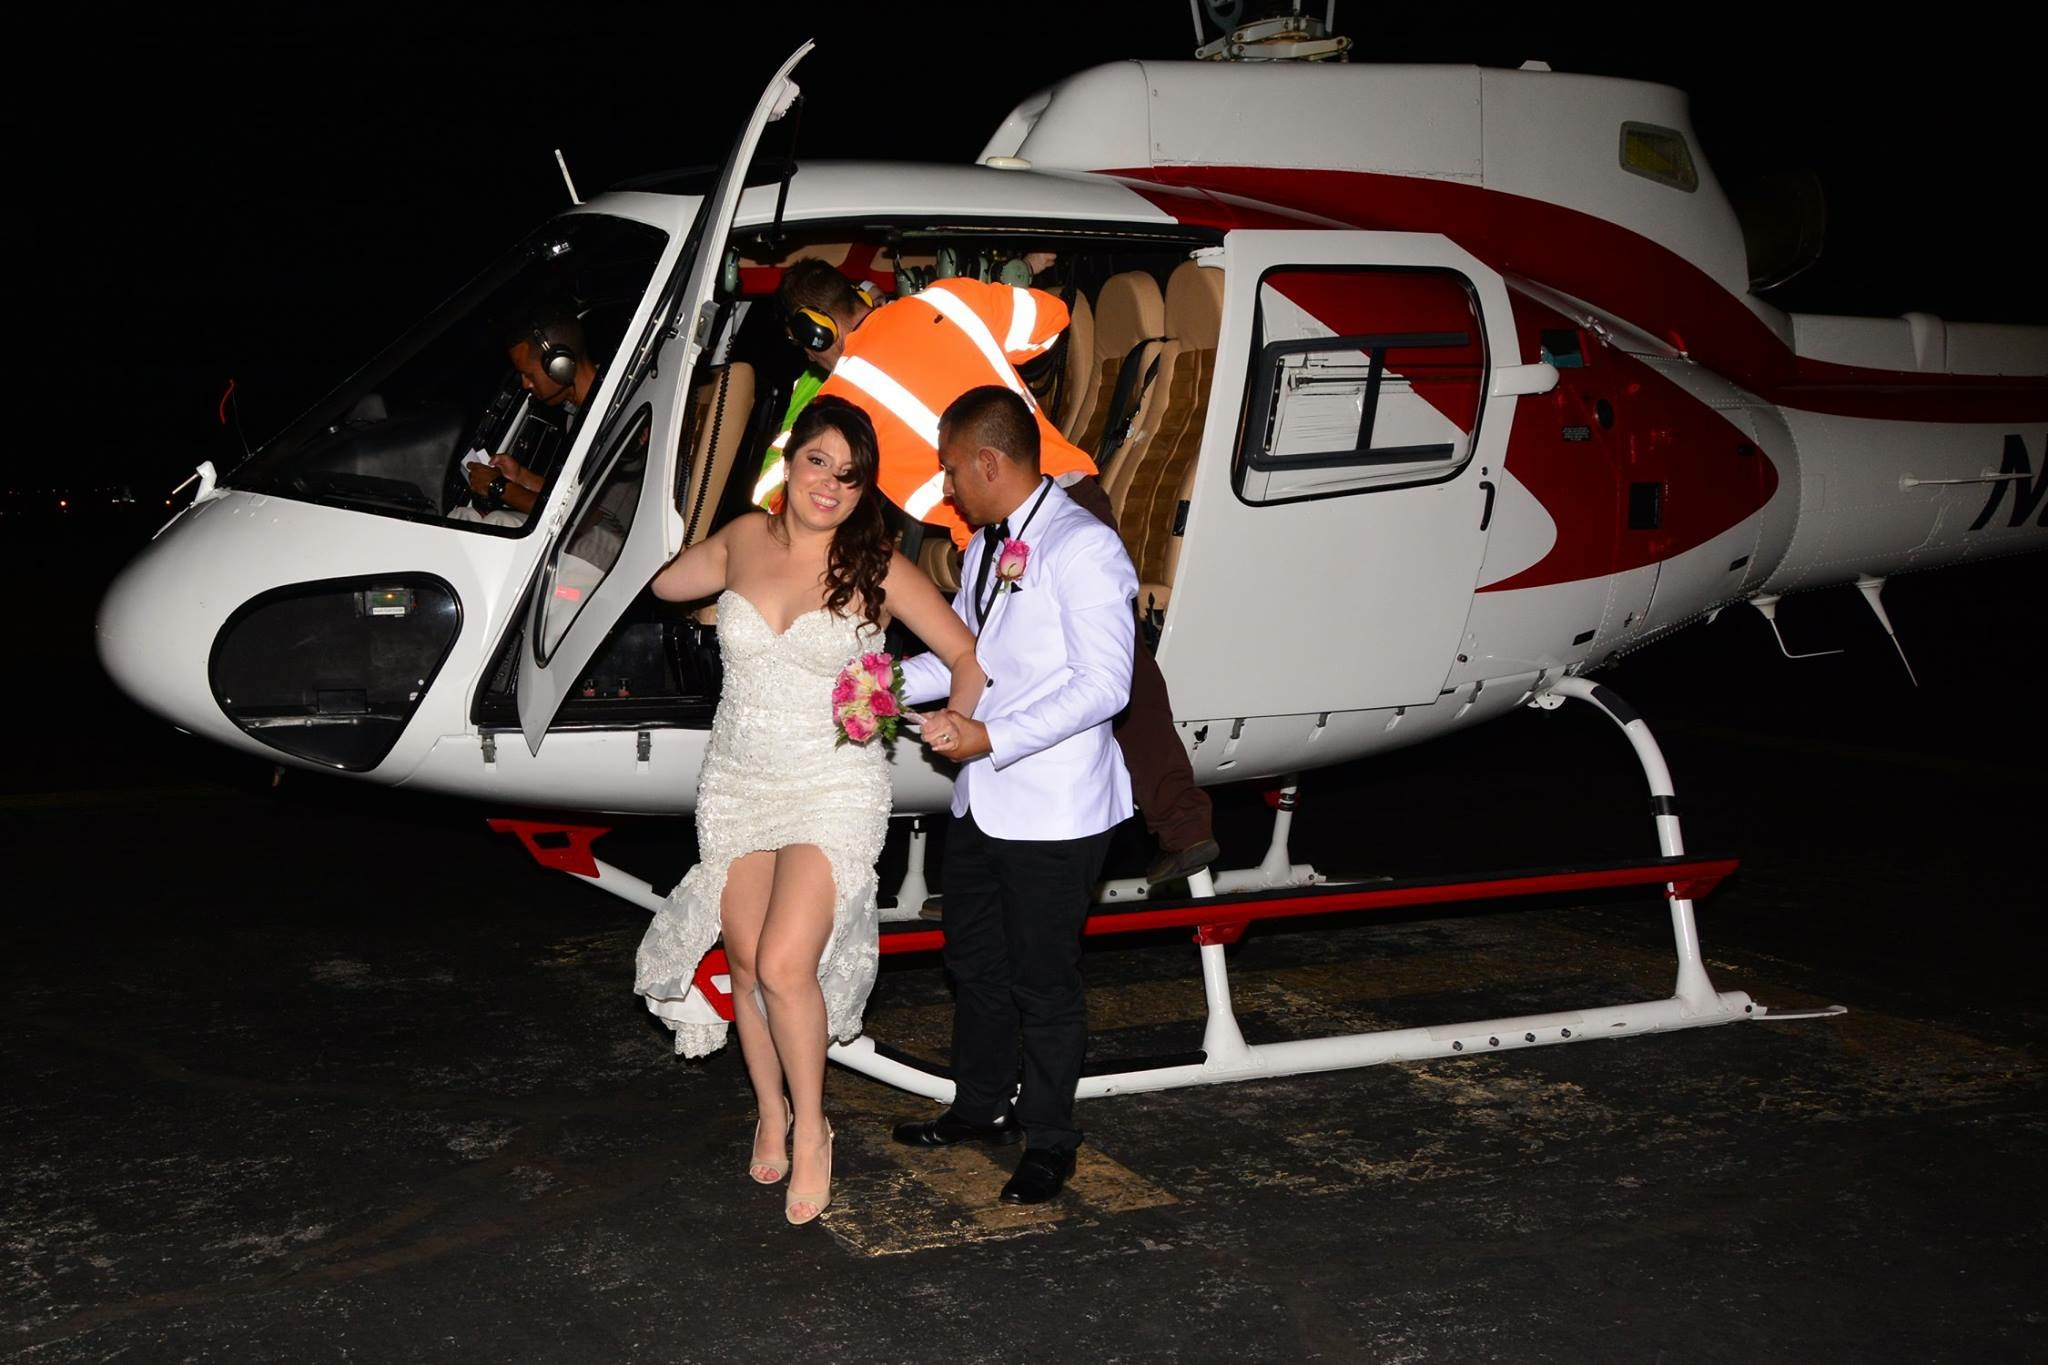 Las Vegas Helikopterhochzeit mit Sag Ja in Las Vegas